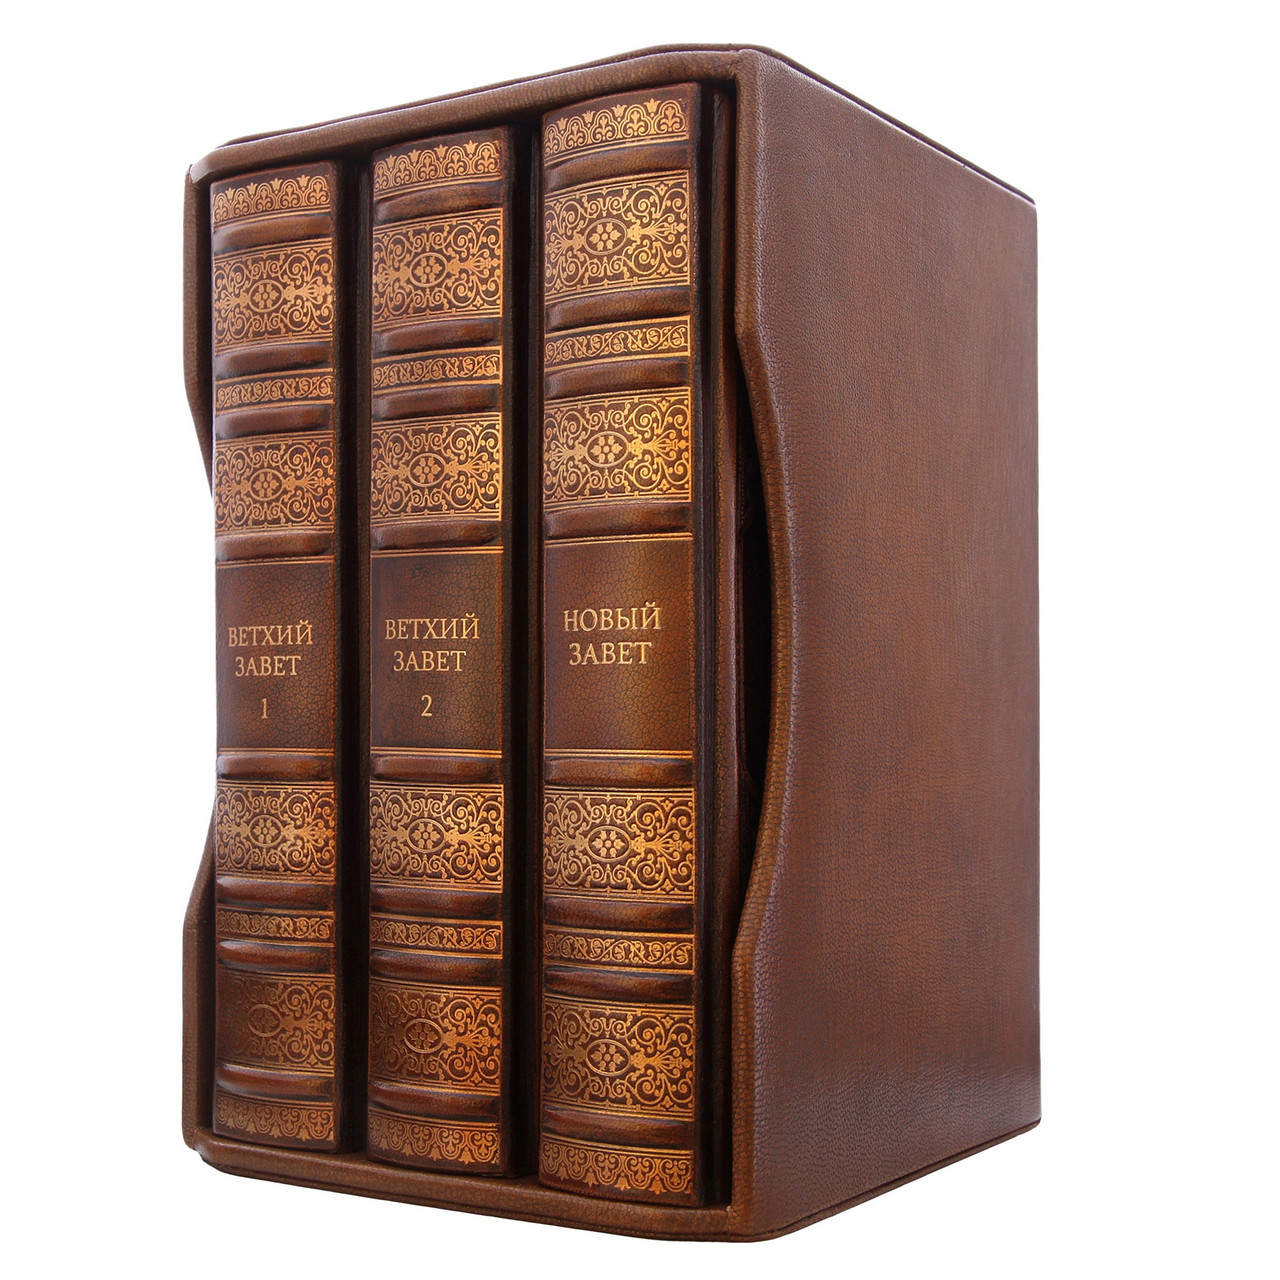 Библия III в томах